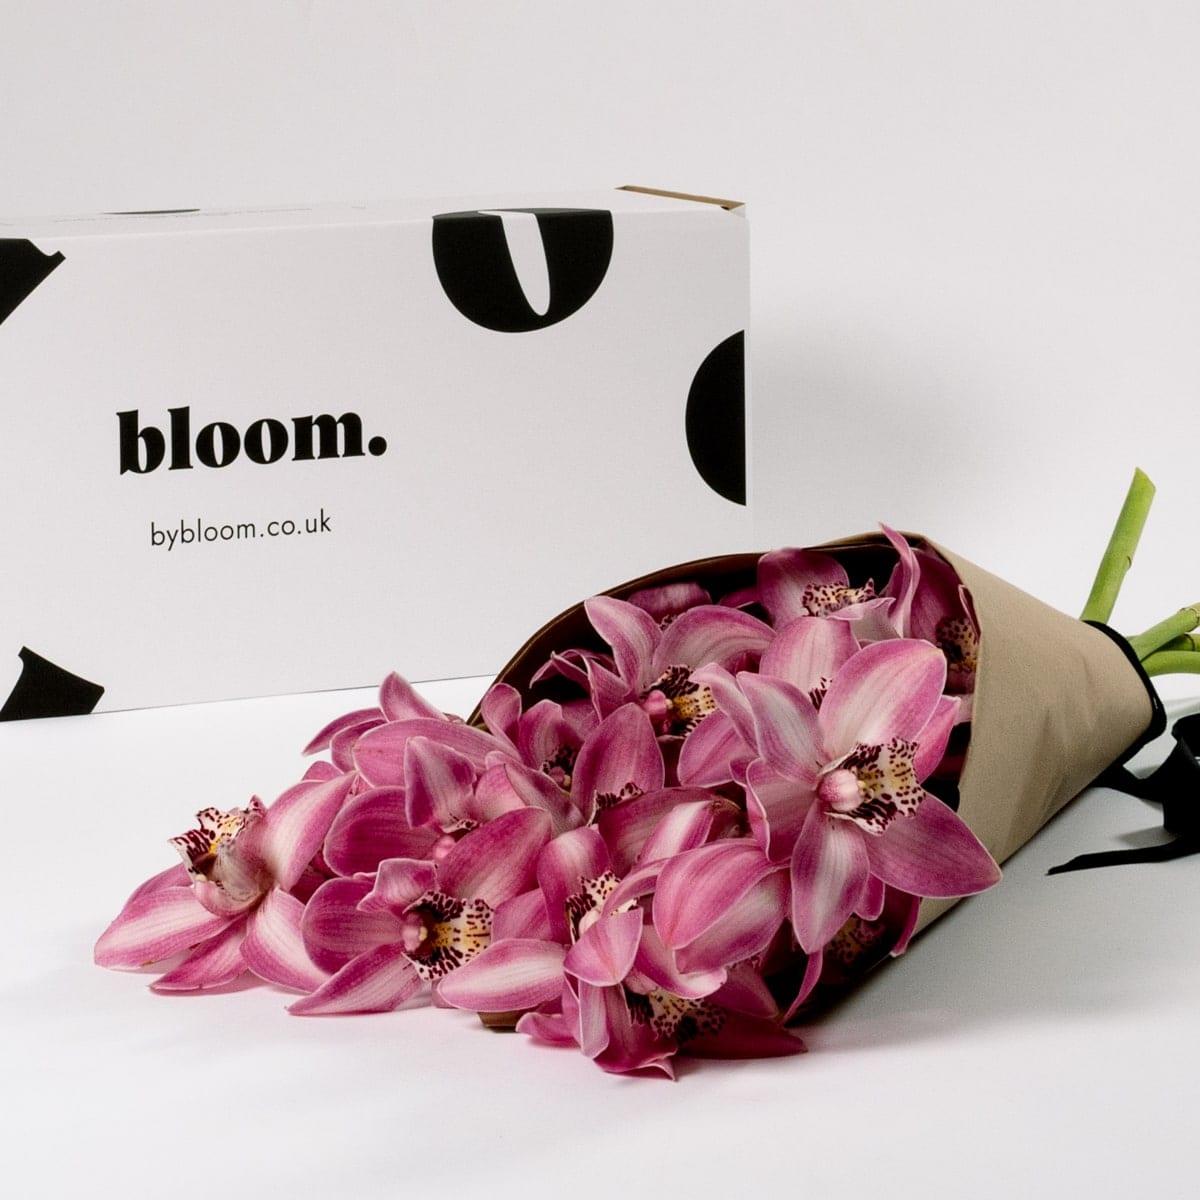 Bloom Flower Delivery | Dusky Rose Pink Cymbidium